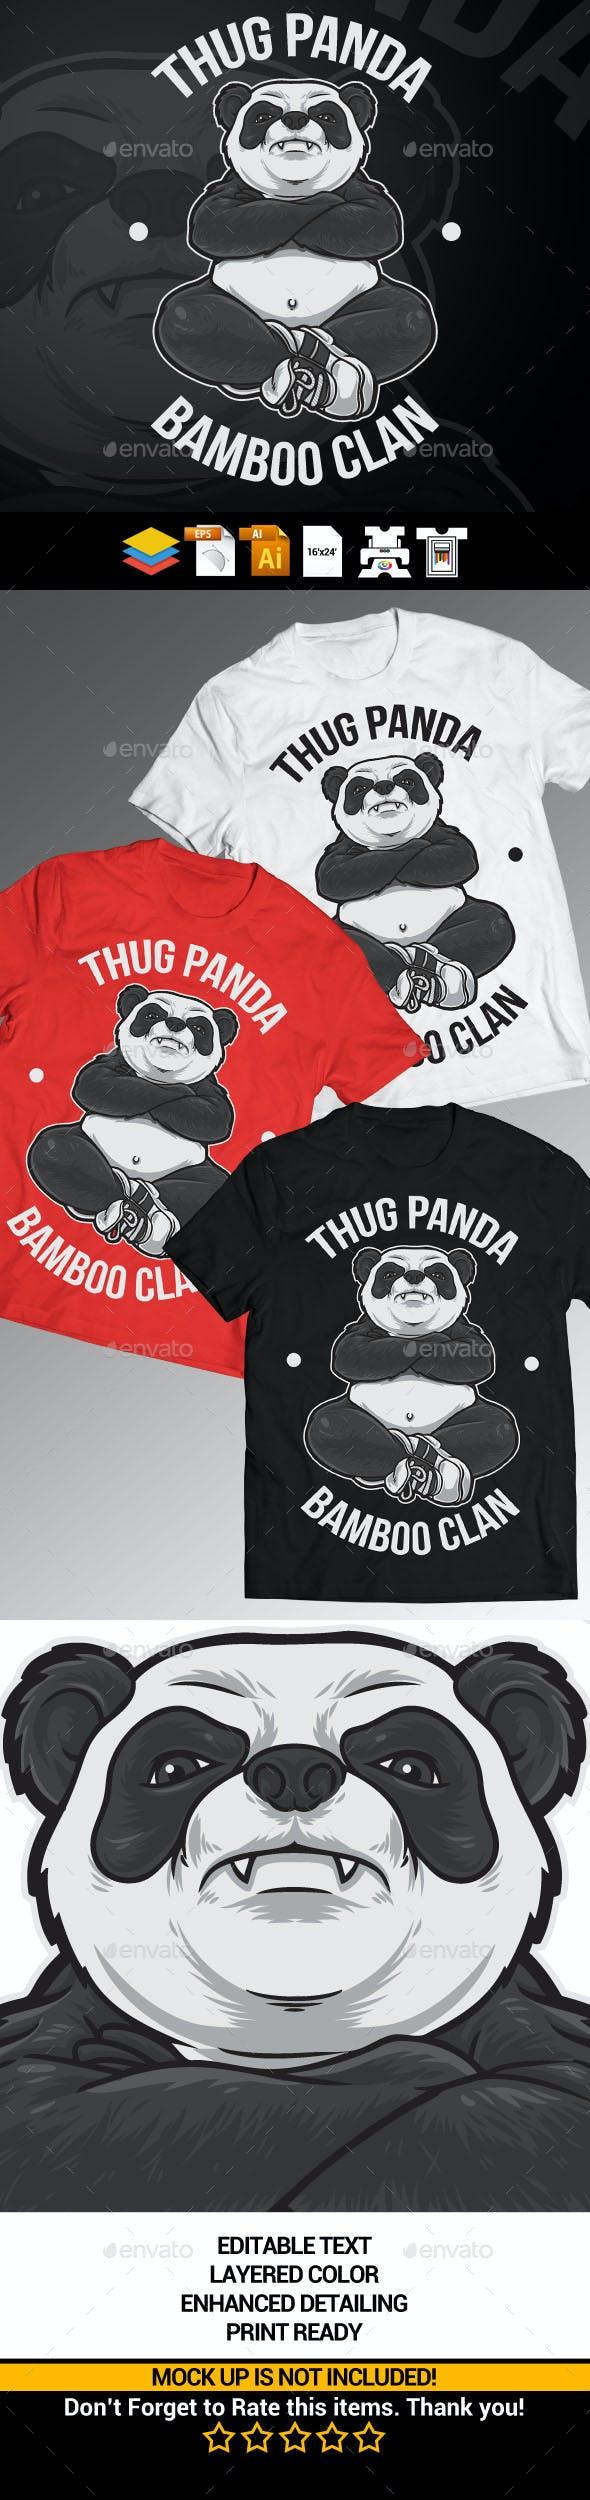 Thug Panda By Rautanstudio Graphicriver